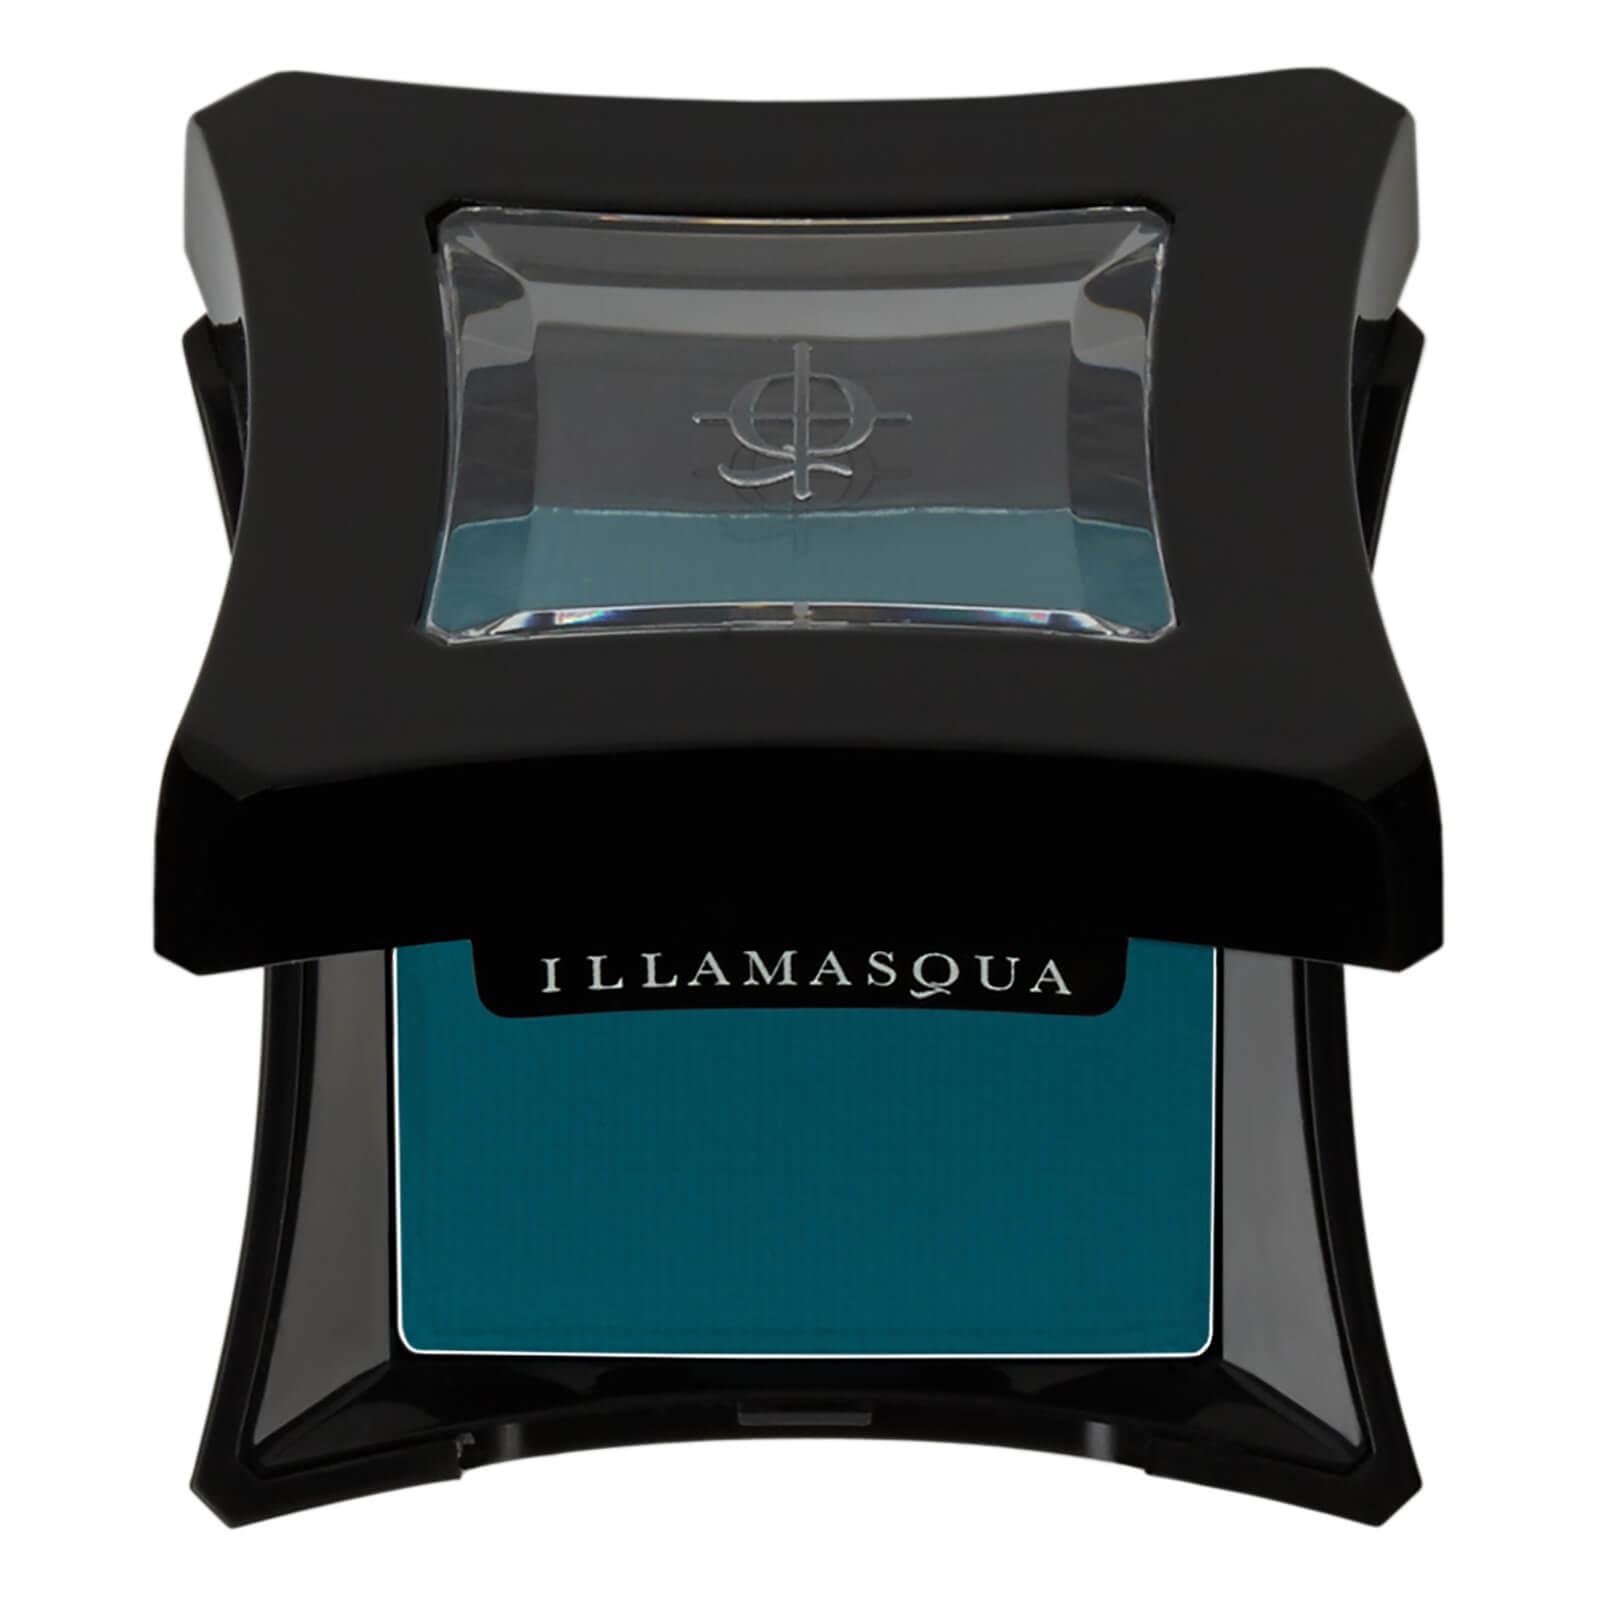 Illamasqua Powder Eye Shadow 2g (Various Shades) - Burst